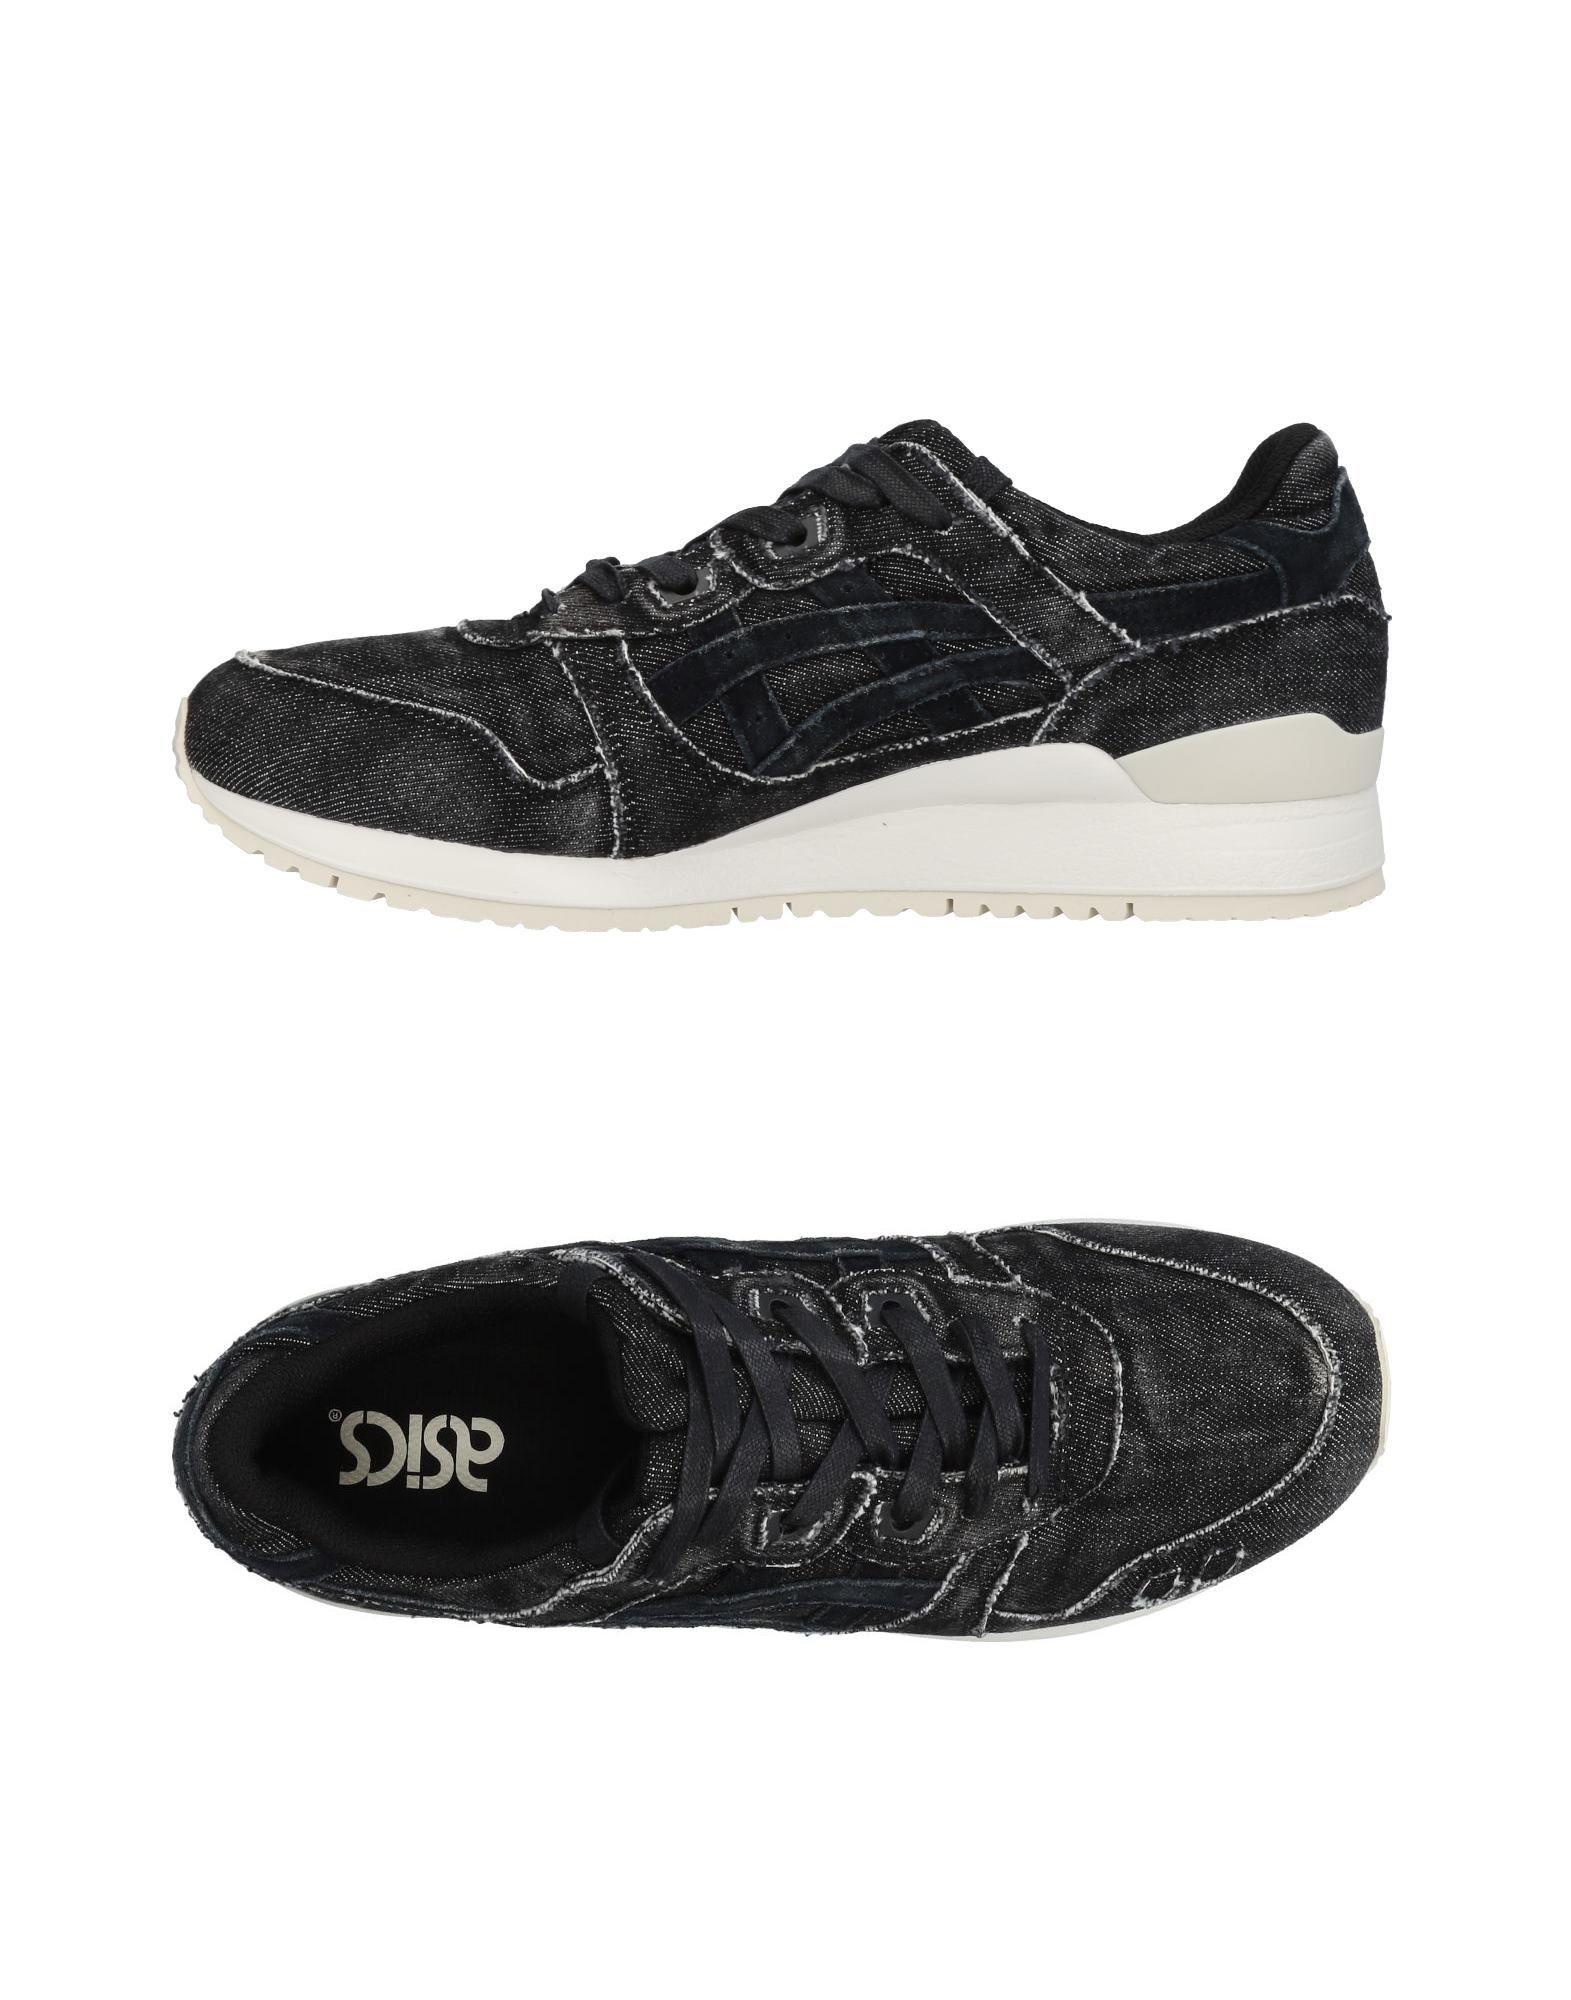 Moda Sneakers Asics Uomo - 11455943DK